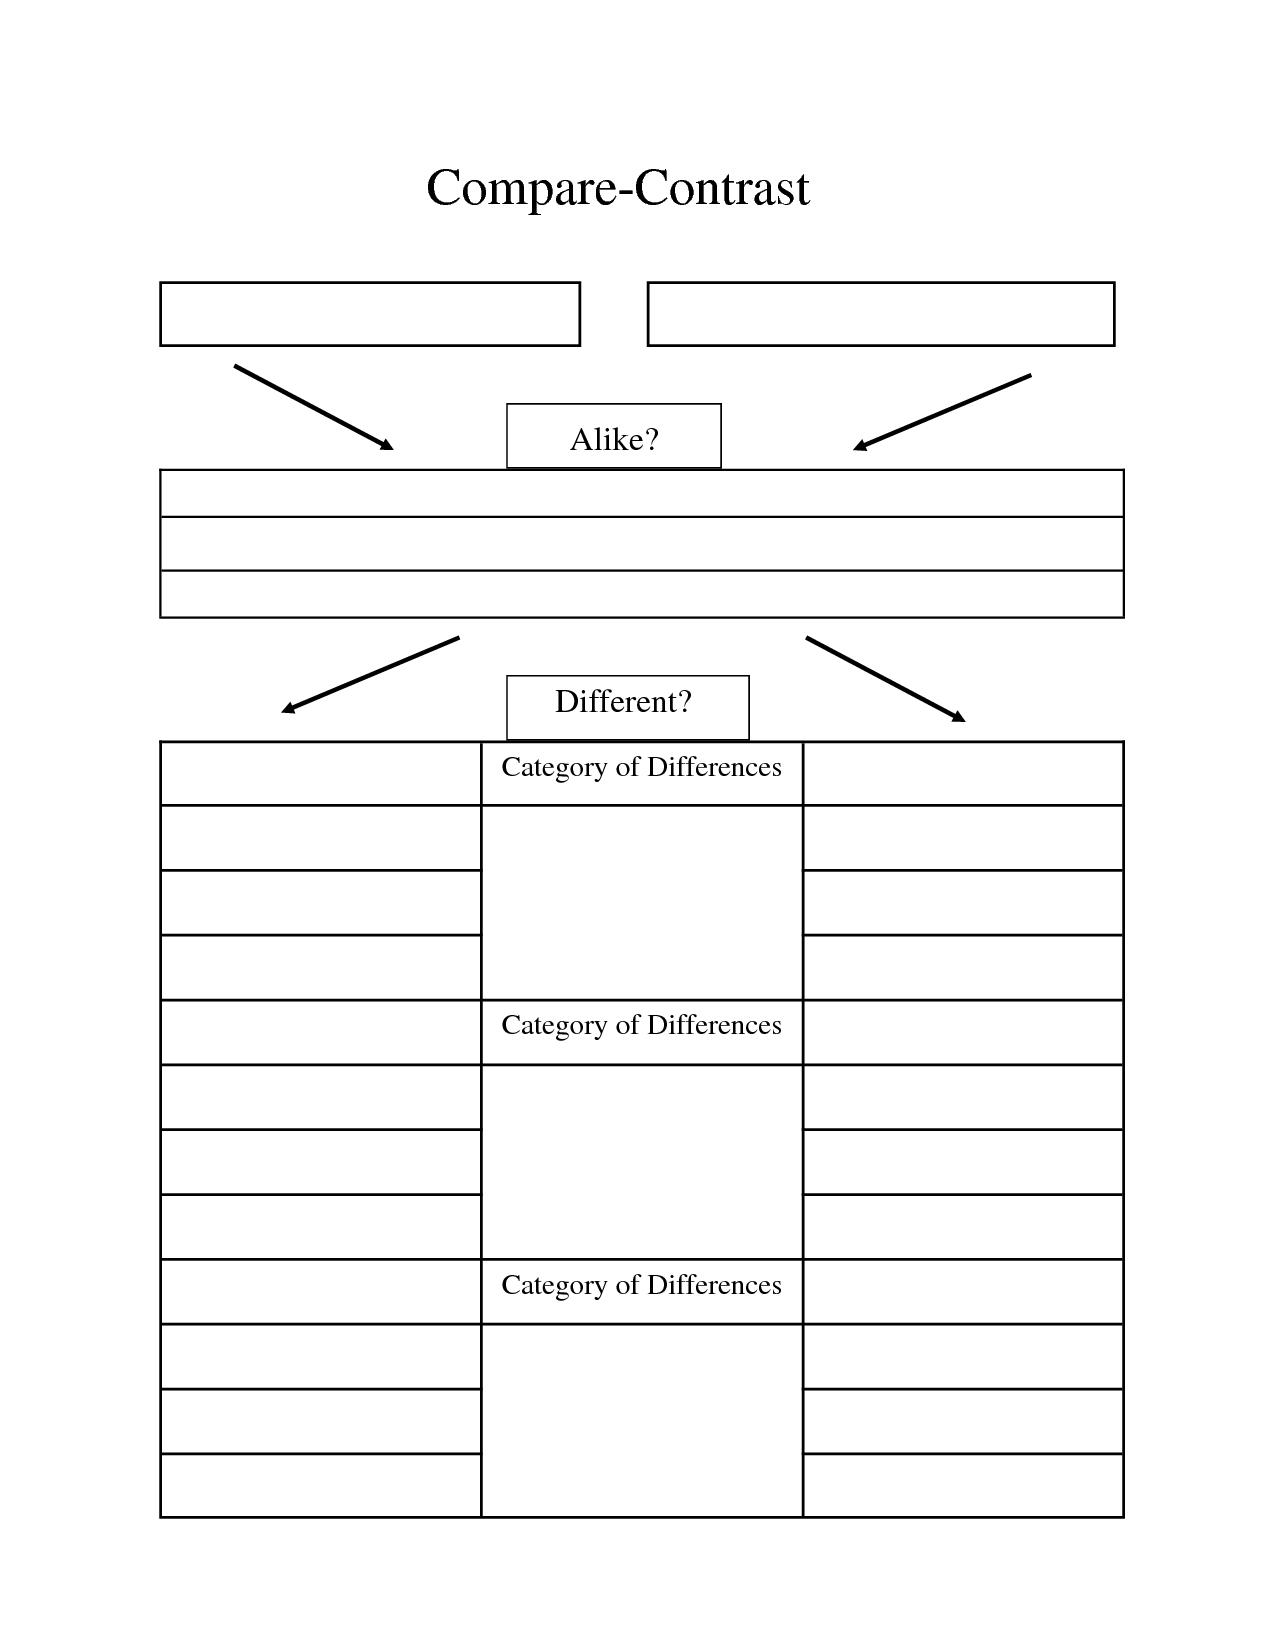 Compare Contrast Essay Graphic Organizer | Compare Contrast Alike - Free Printable Compare And Contrast Graphic Organizer